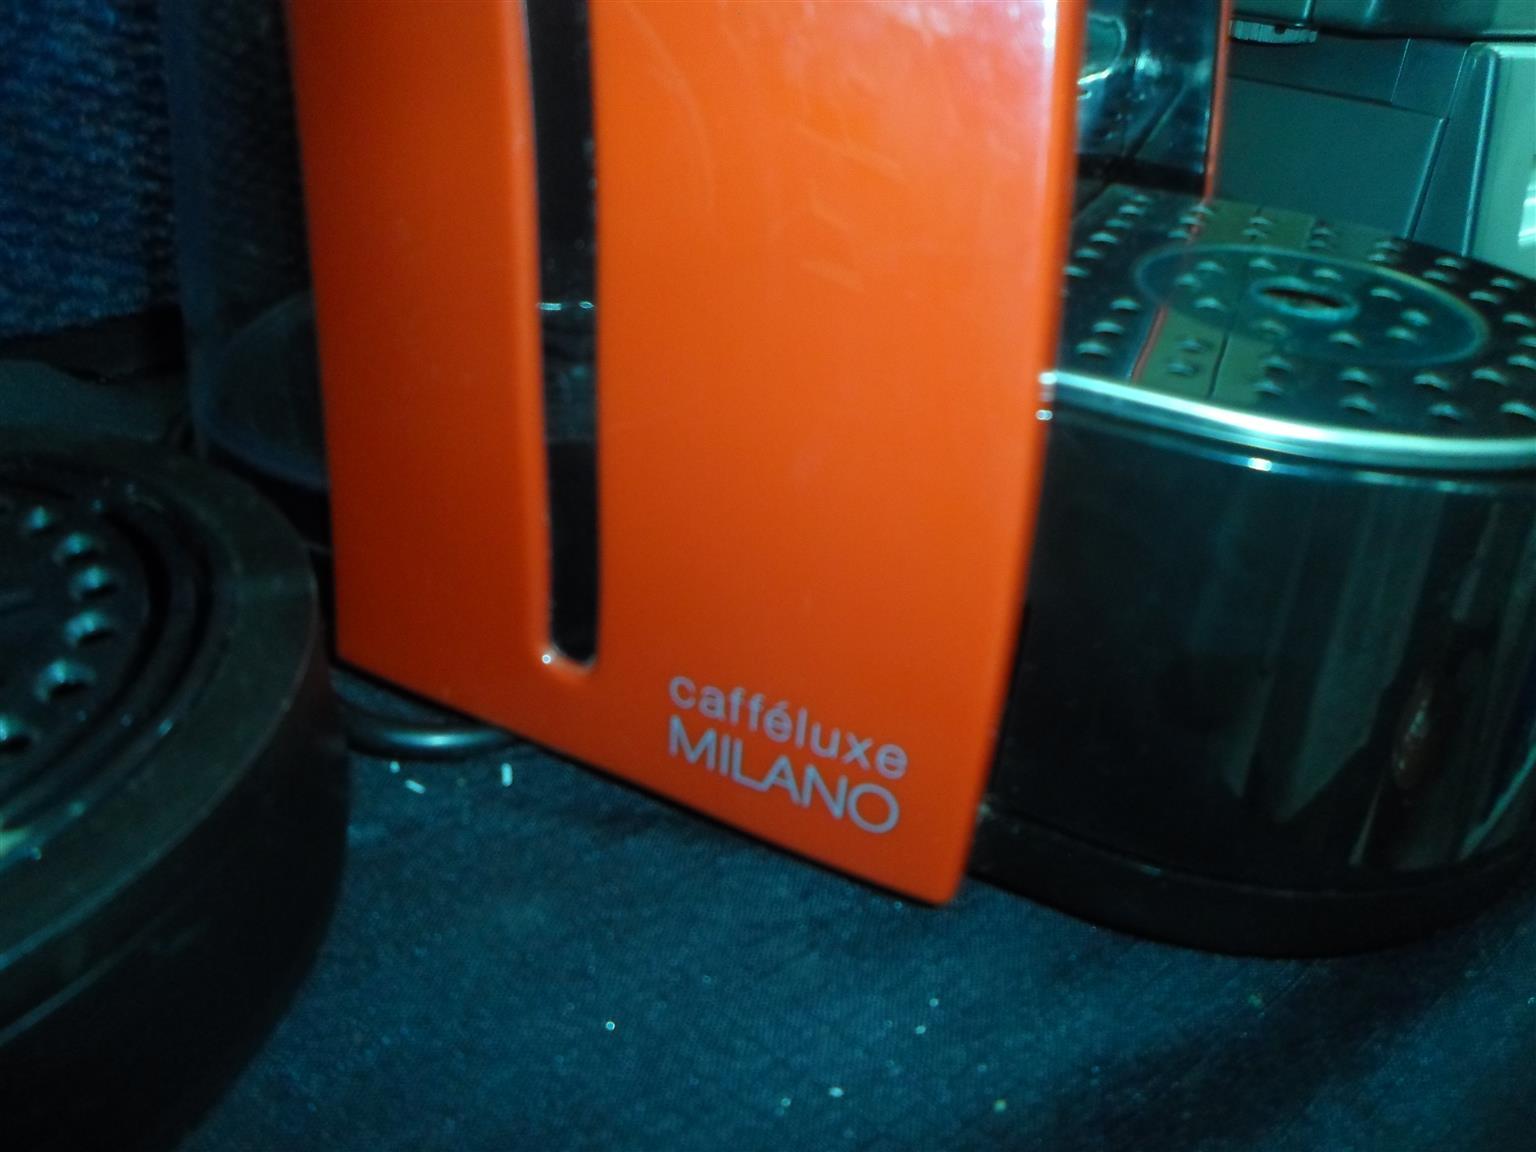 Caffeluxe Milano Coffee Machine